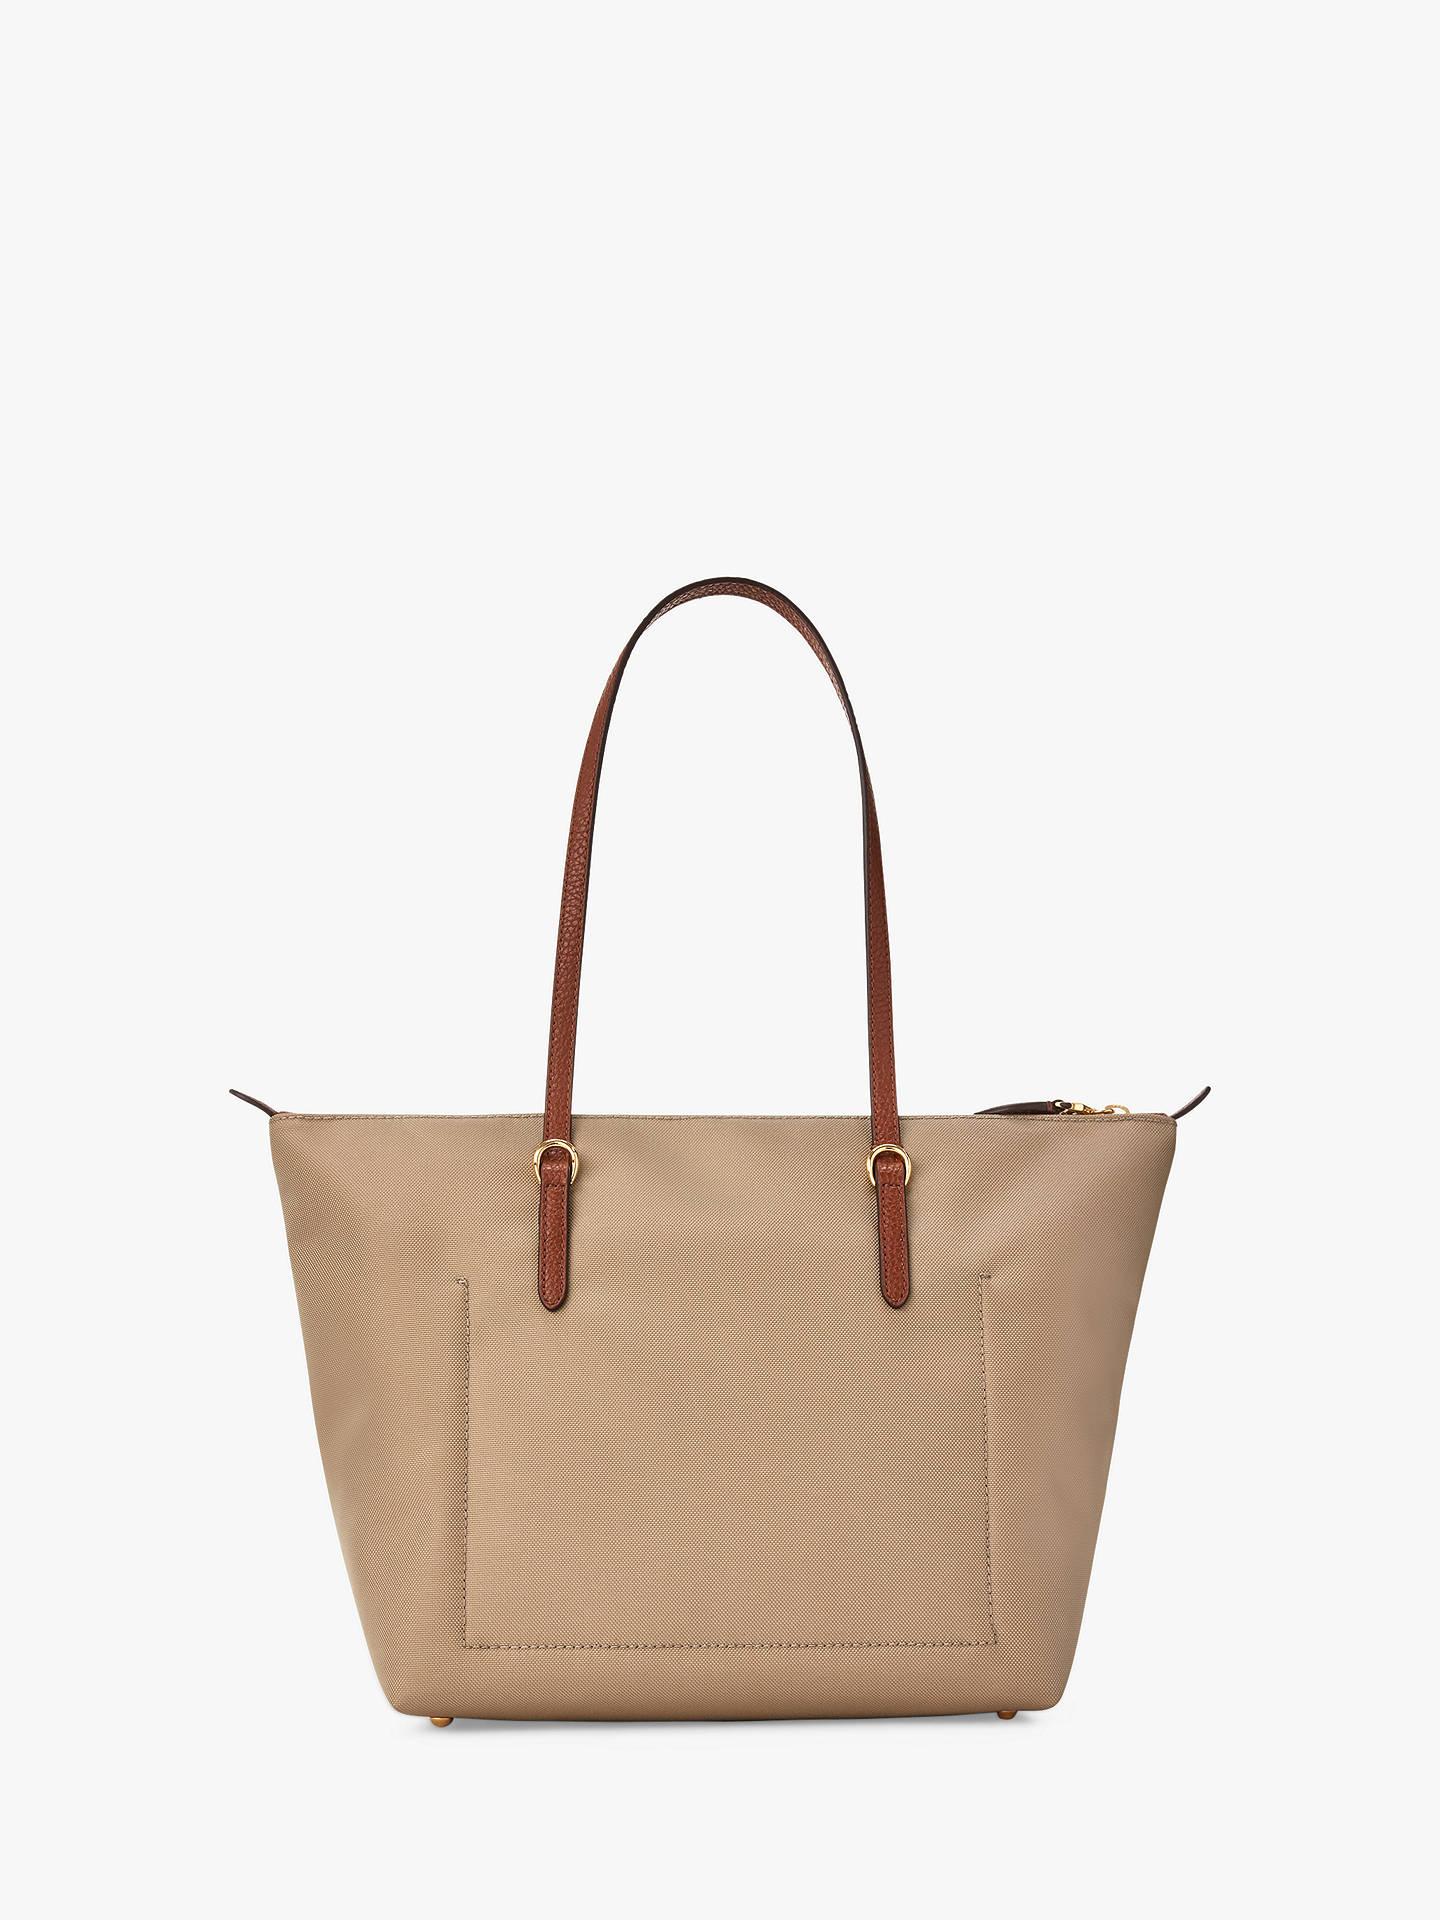 34927fe8d ... Buy Lauren Ralph Lauren Chadwick Keaton 26 Shopper Bag, Clay Online at  johnlewis.com ...